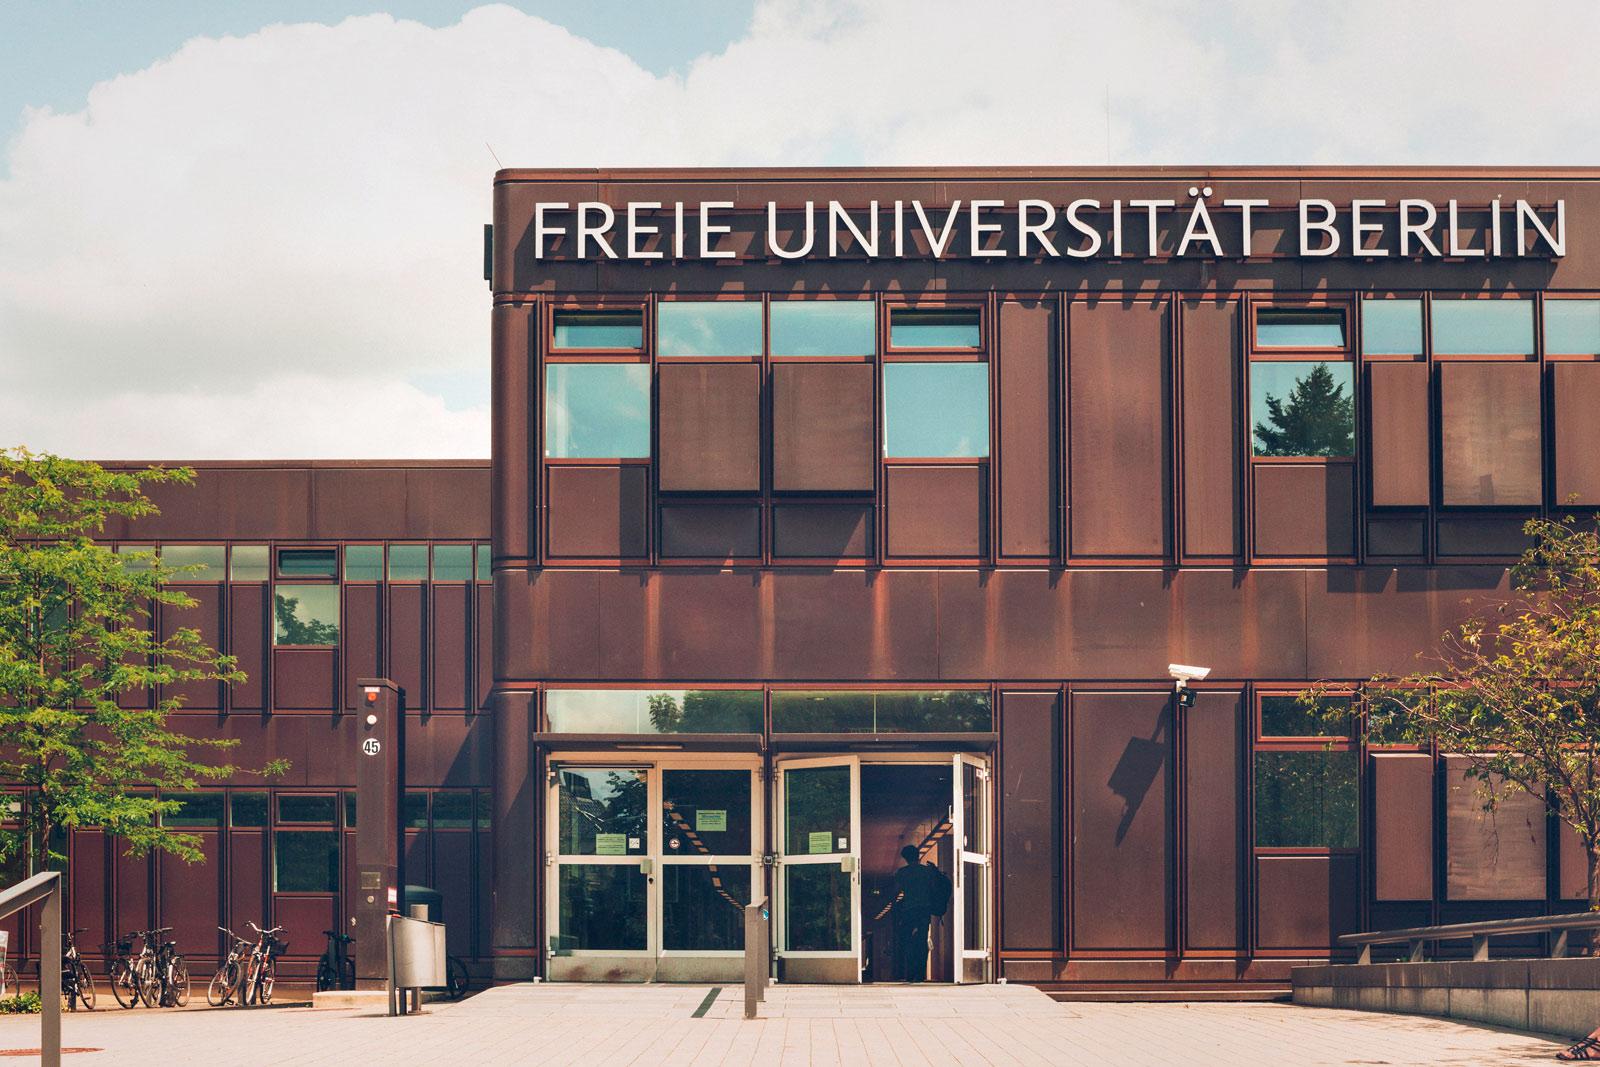 Freie Universitat Berlin - uncubemagazine.com